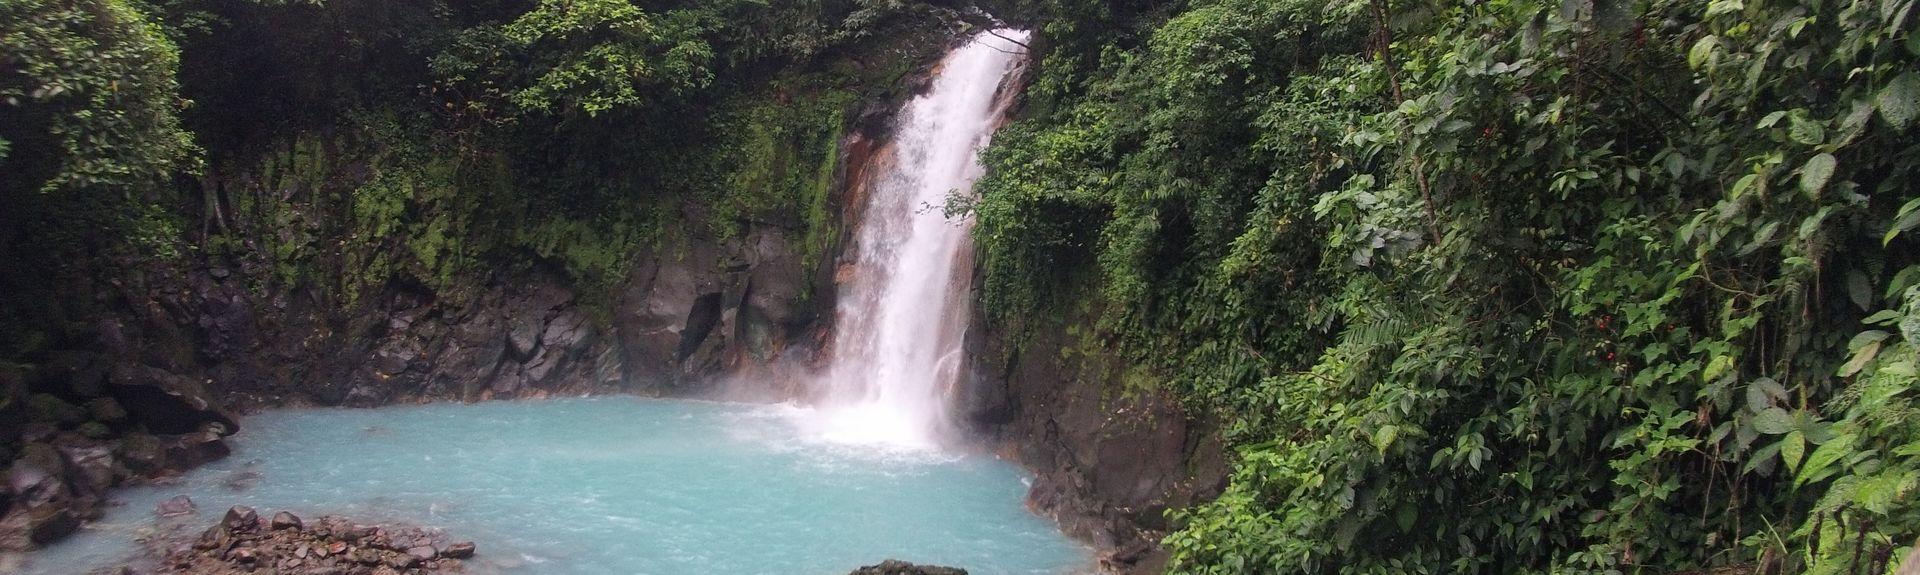 Katira, Provincia de Alajuela, Costa Rica